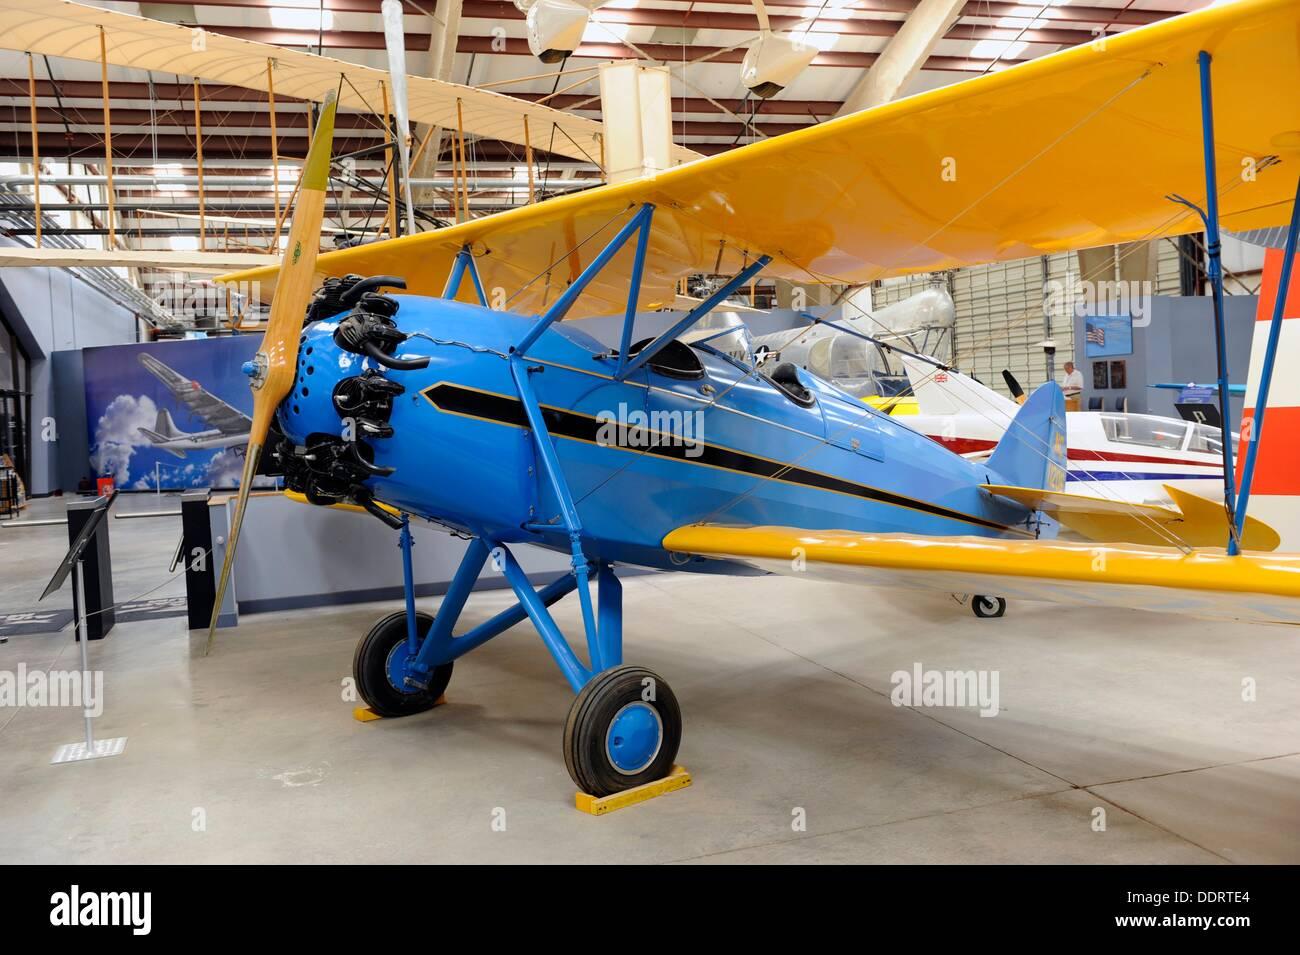 Waco RNF Civil Biplane at Pima Air and Space Museum Tucson Arizona - Stock Image